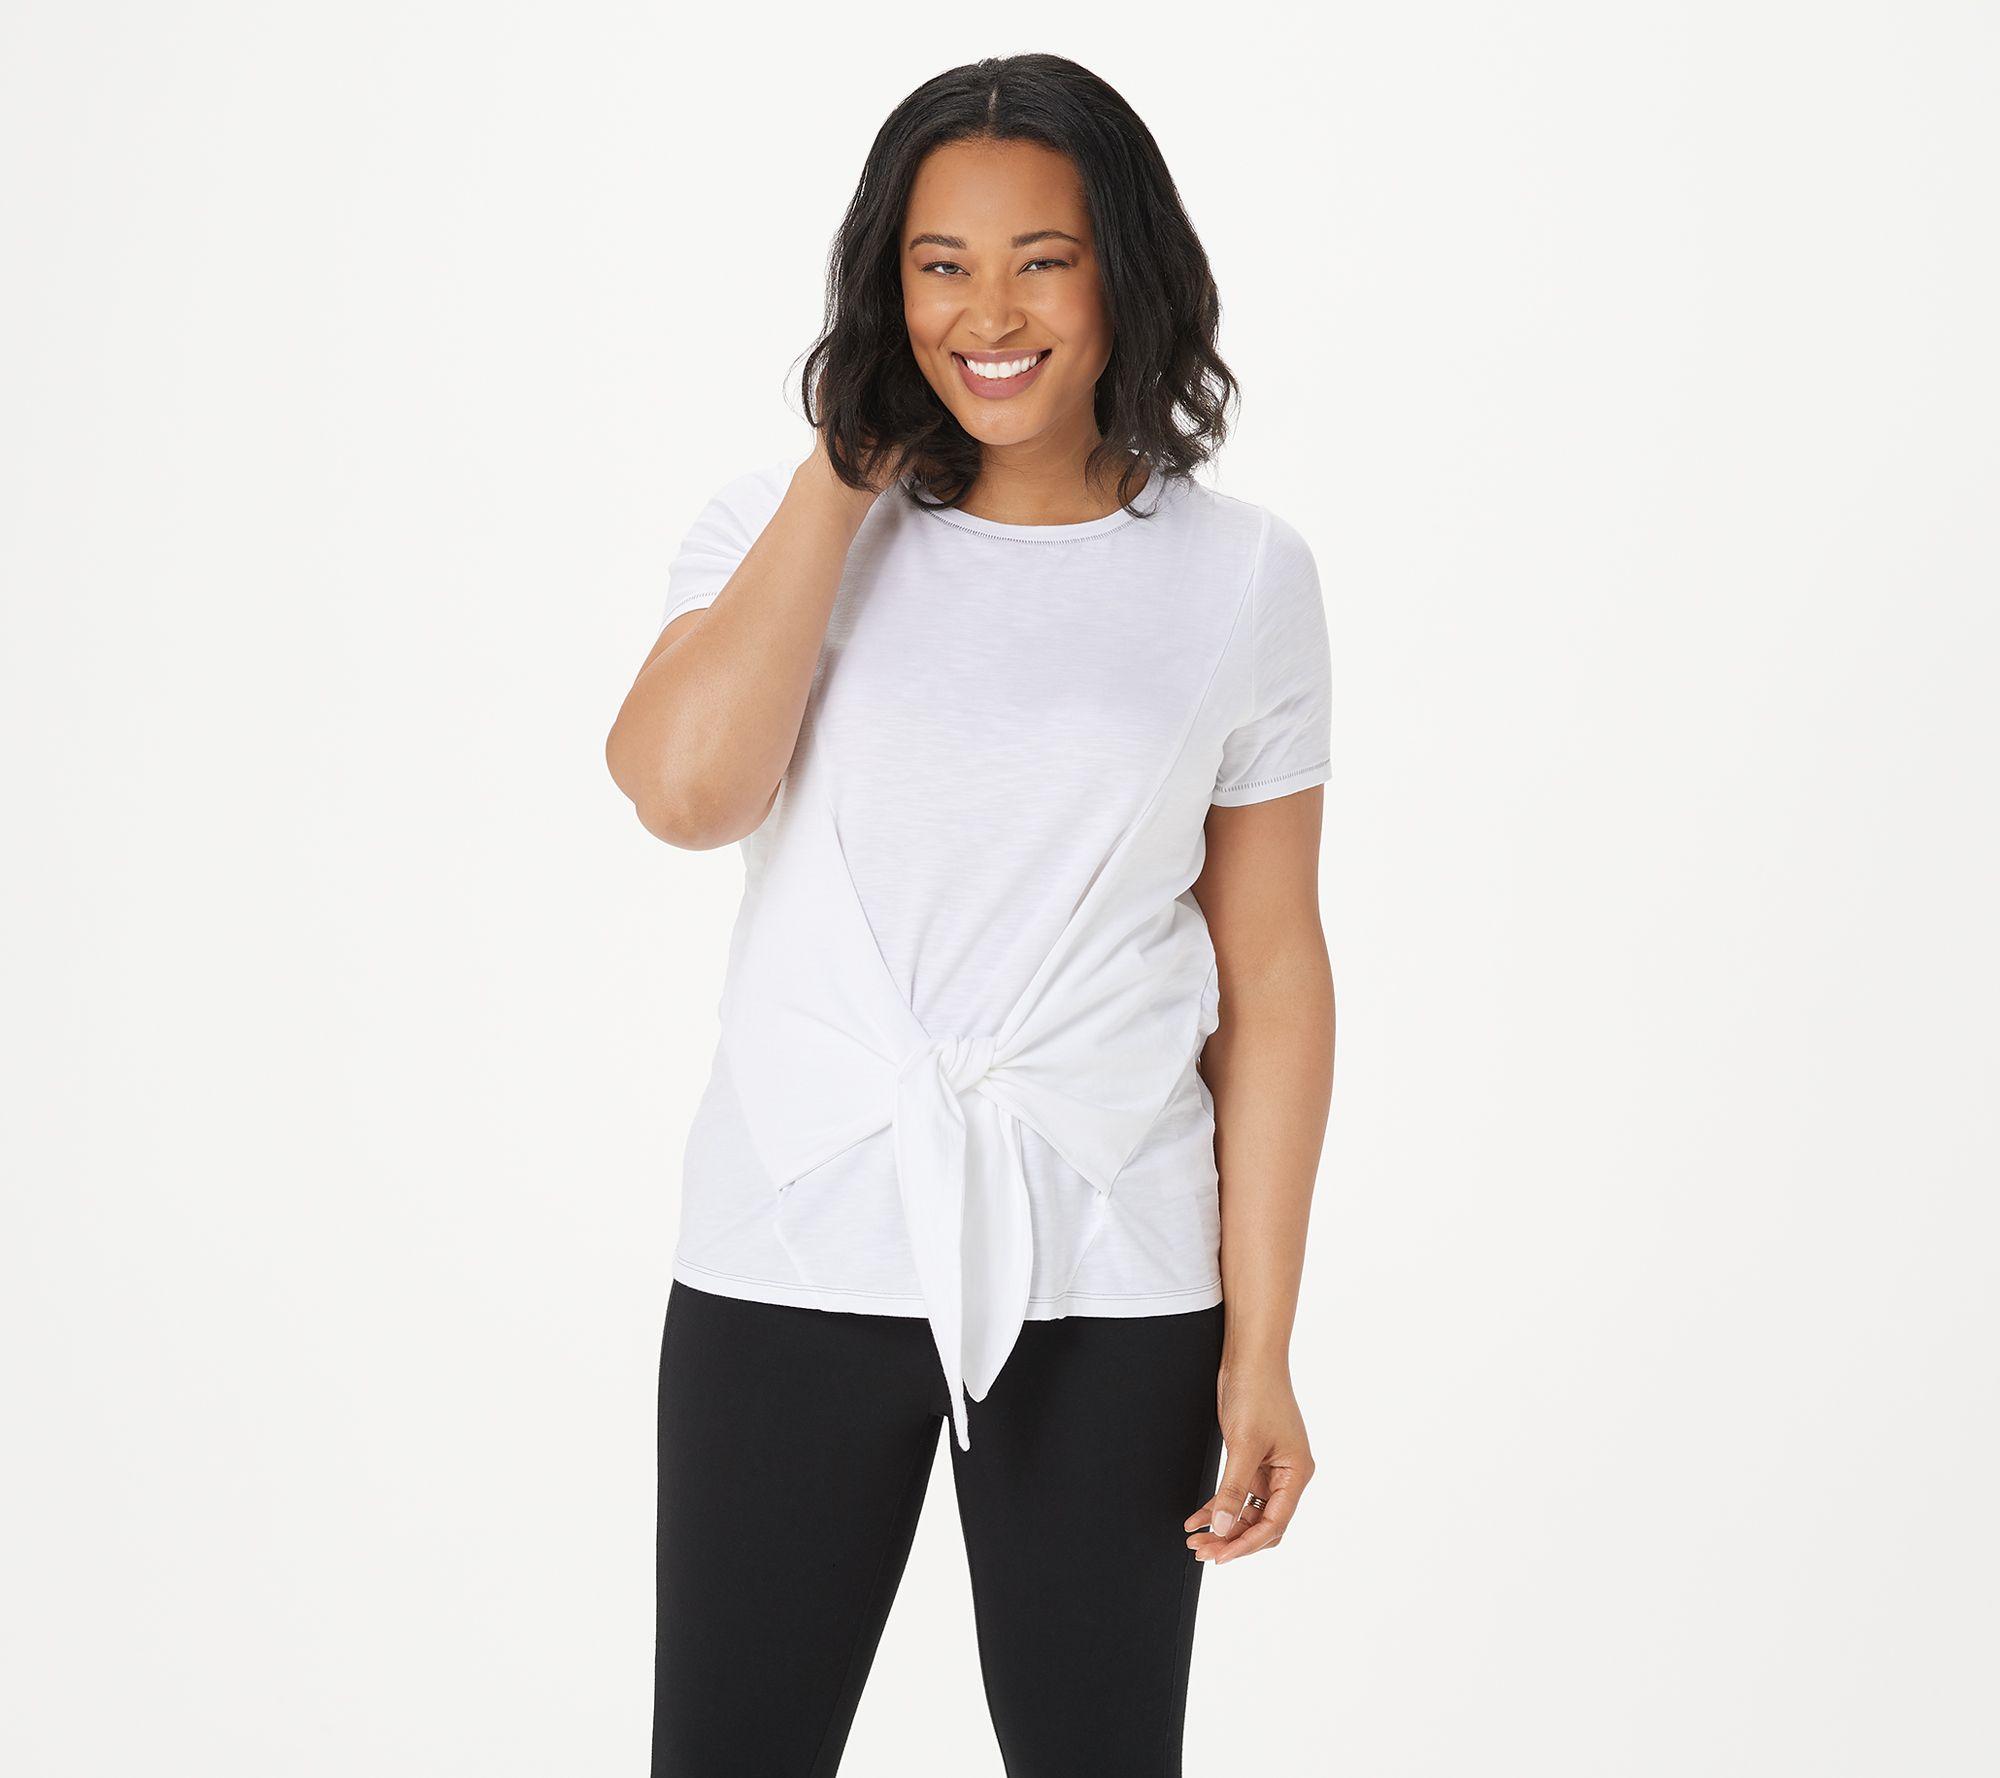 AnyBody Cozy Knit Side Tie T-Shirt Pocket Cream 1X NEW A353777